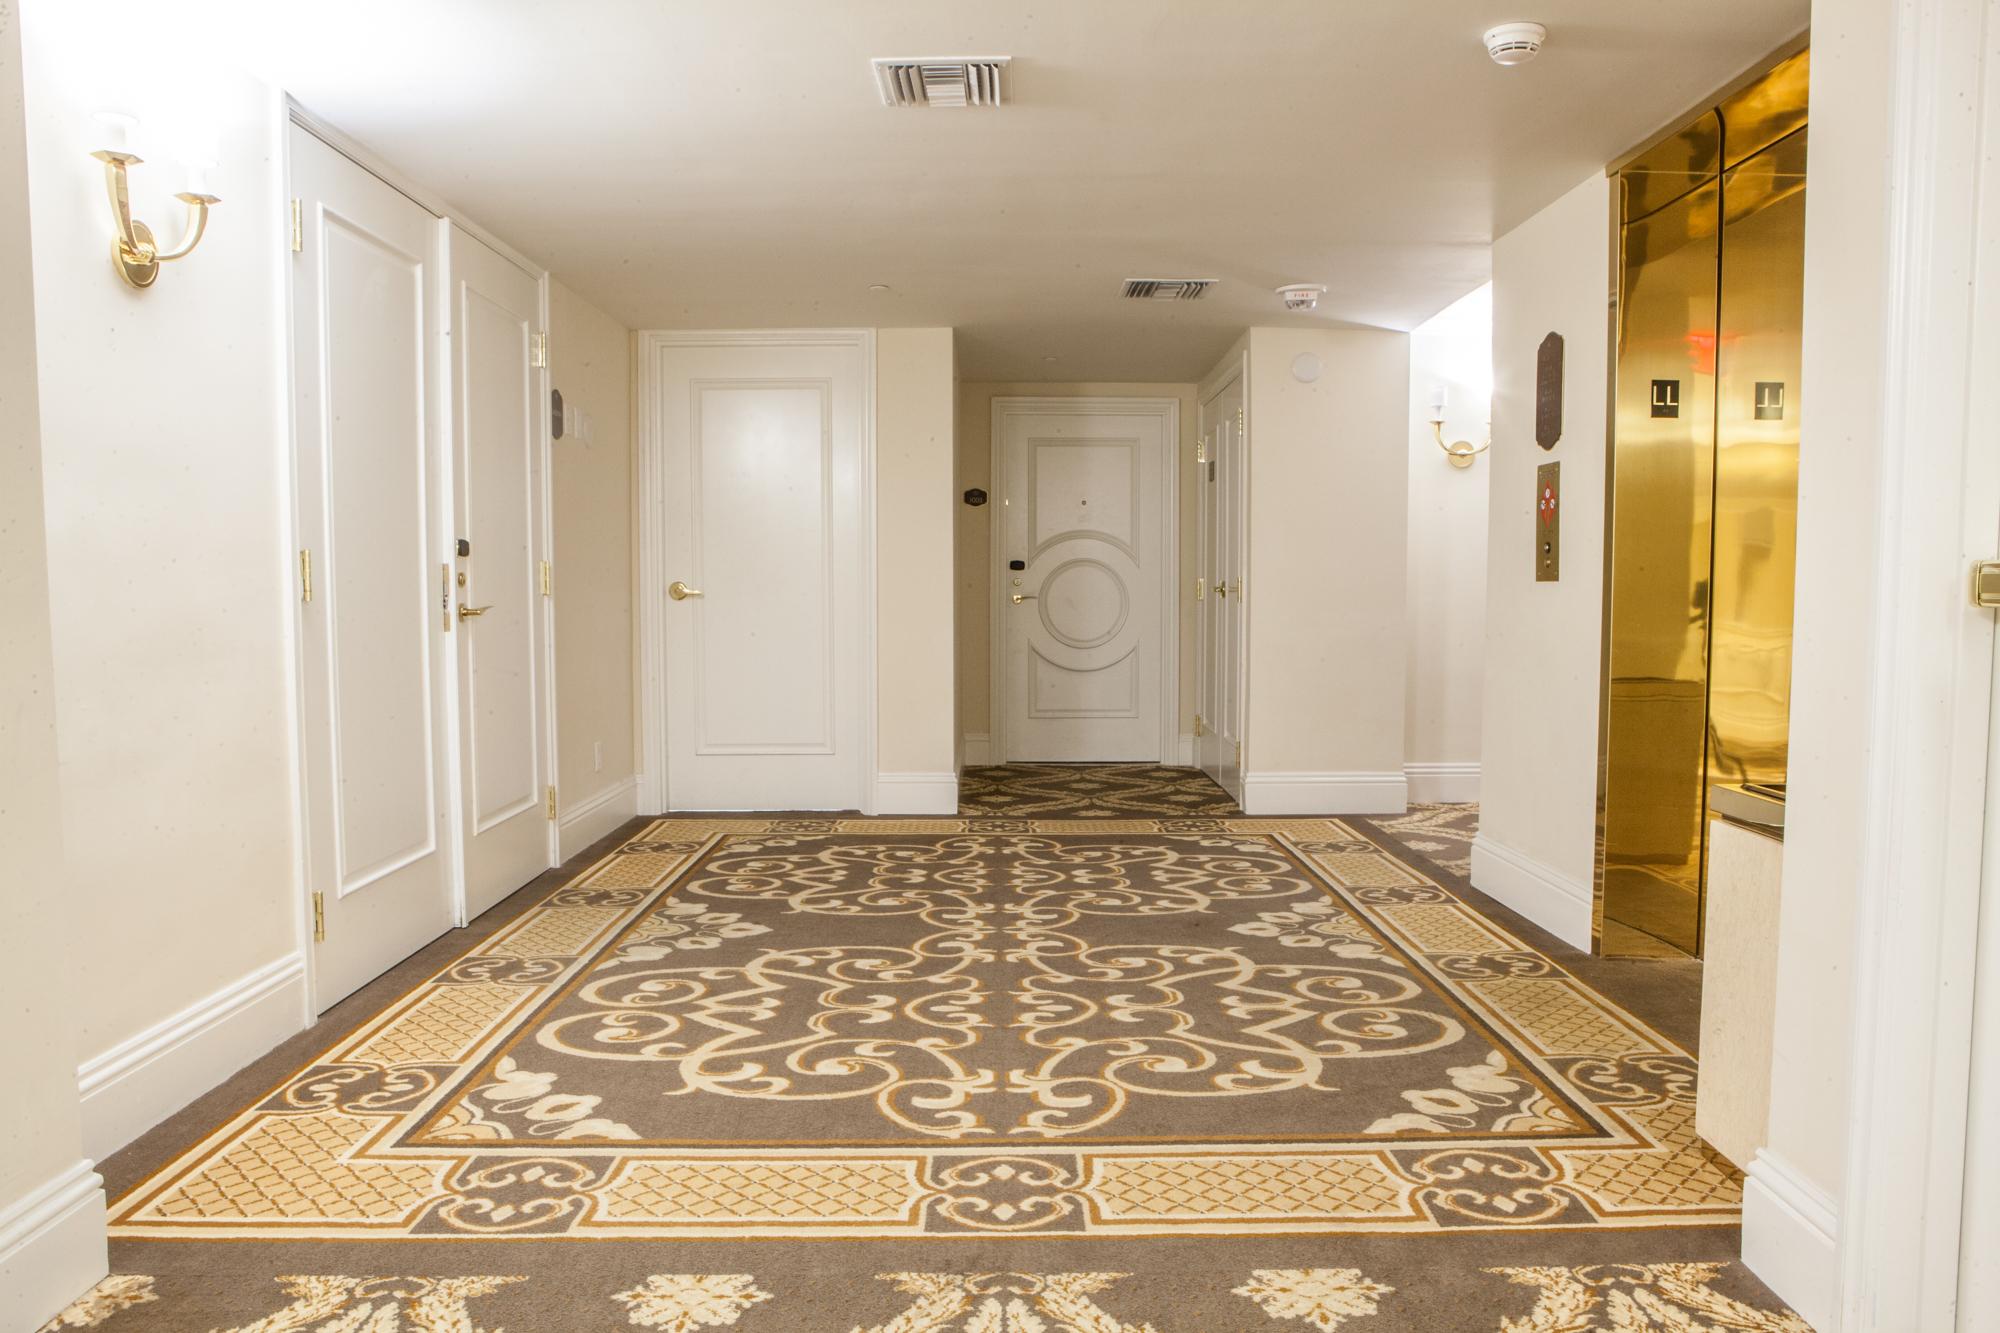 East Coast Flooring Installs Carpet at Trump Resort in Doral